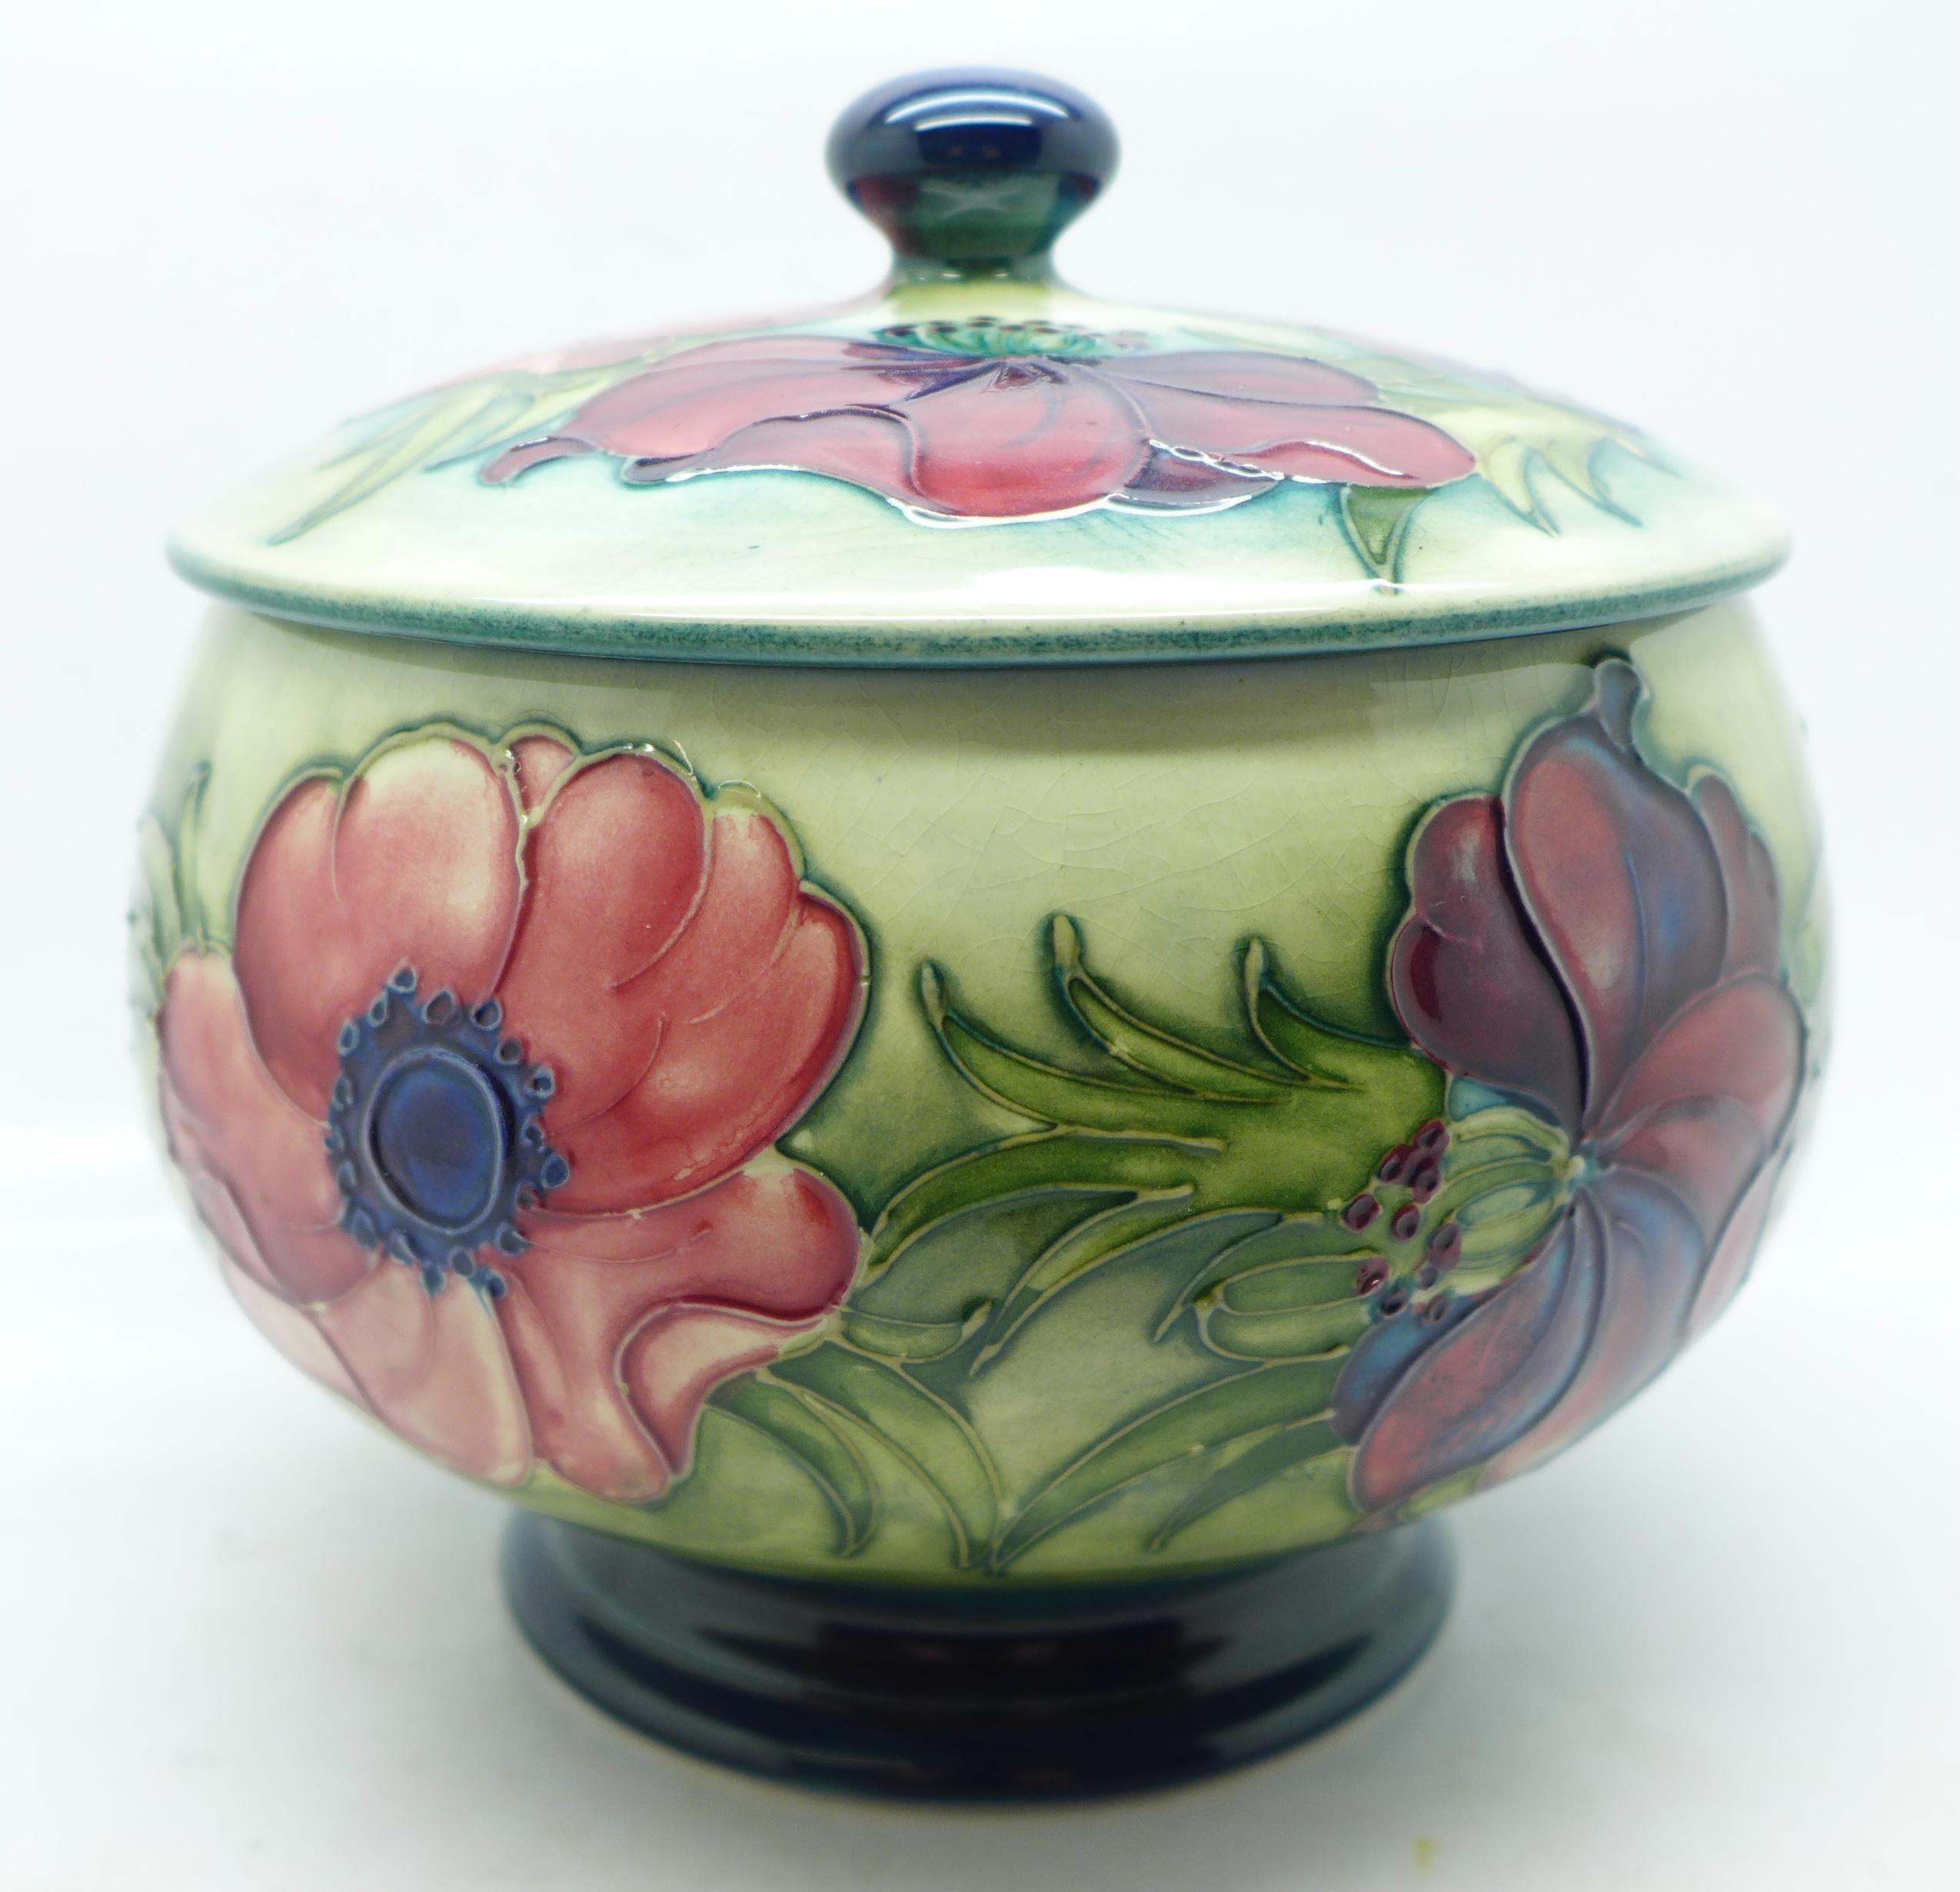 A Moorcroft anemone lidded pot, 12.5cm diameter - Image 5 of 8